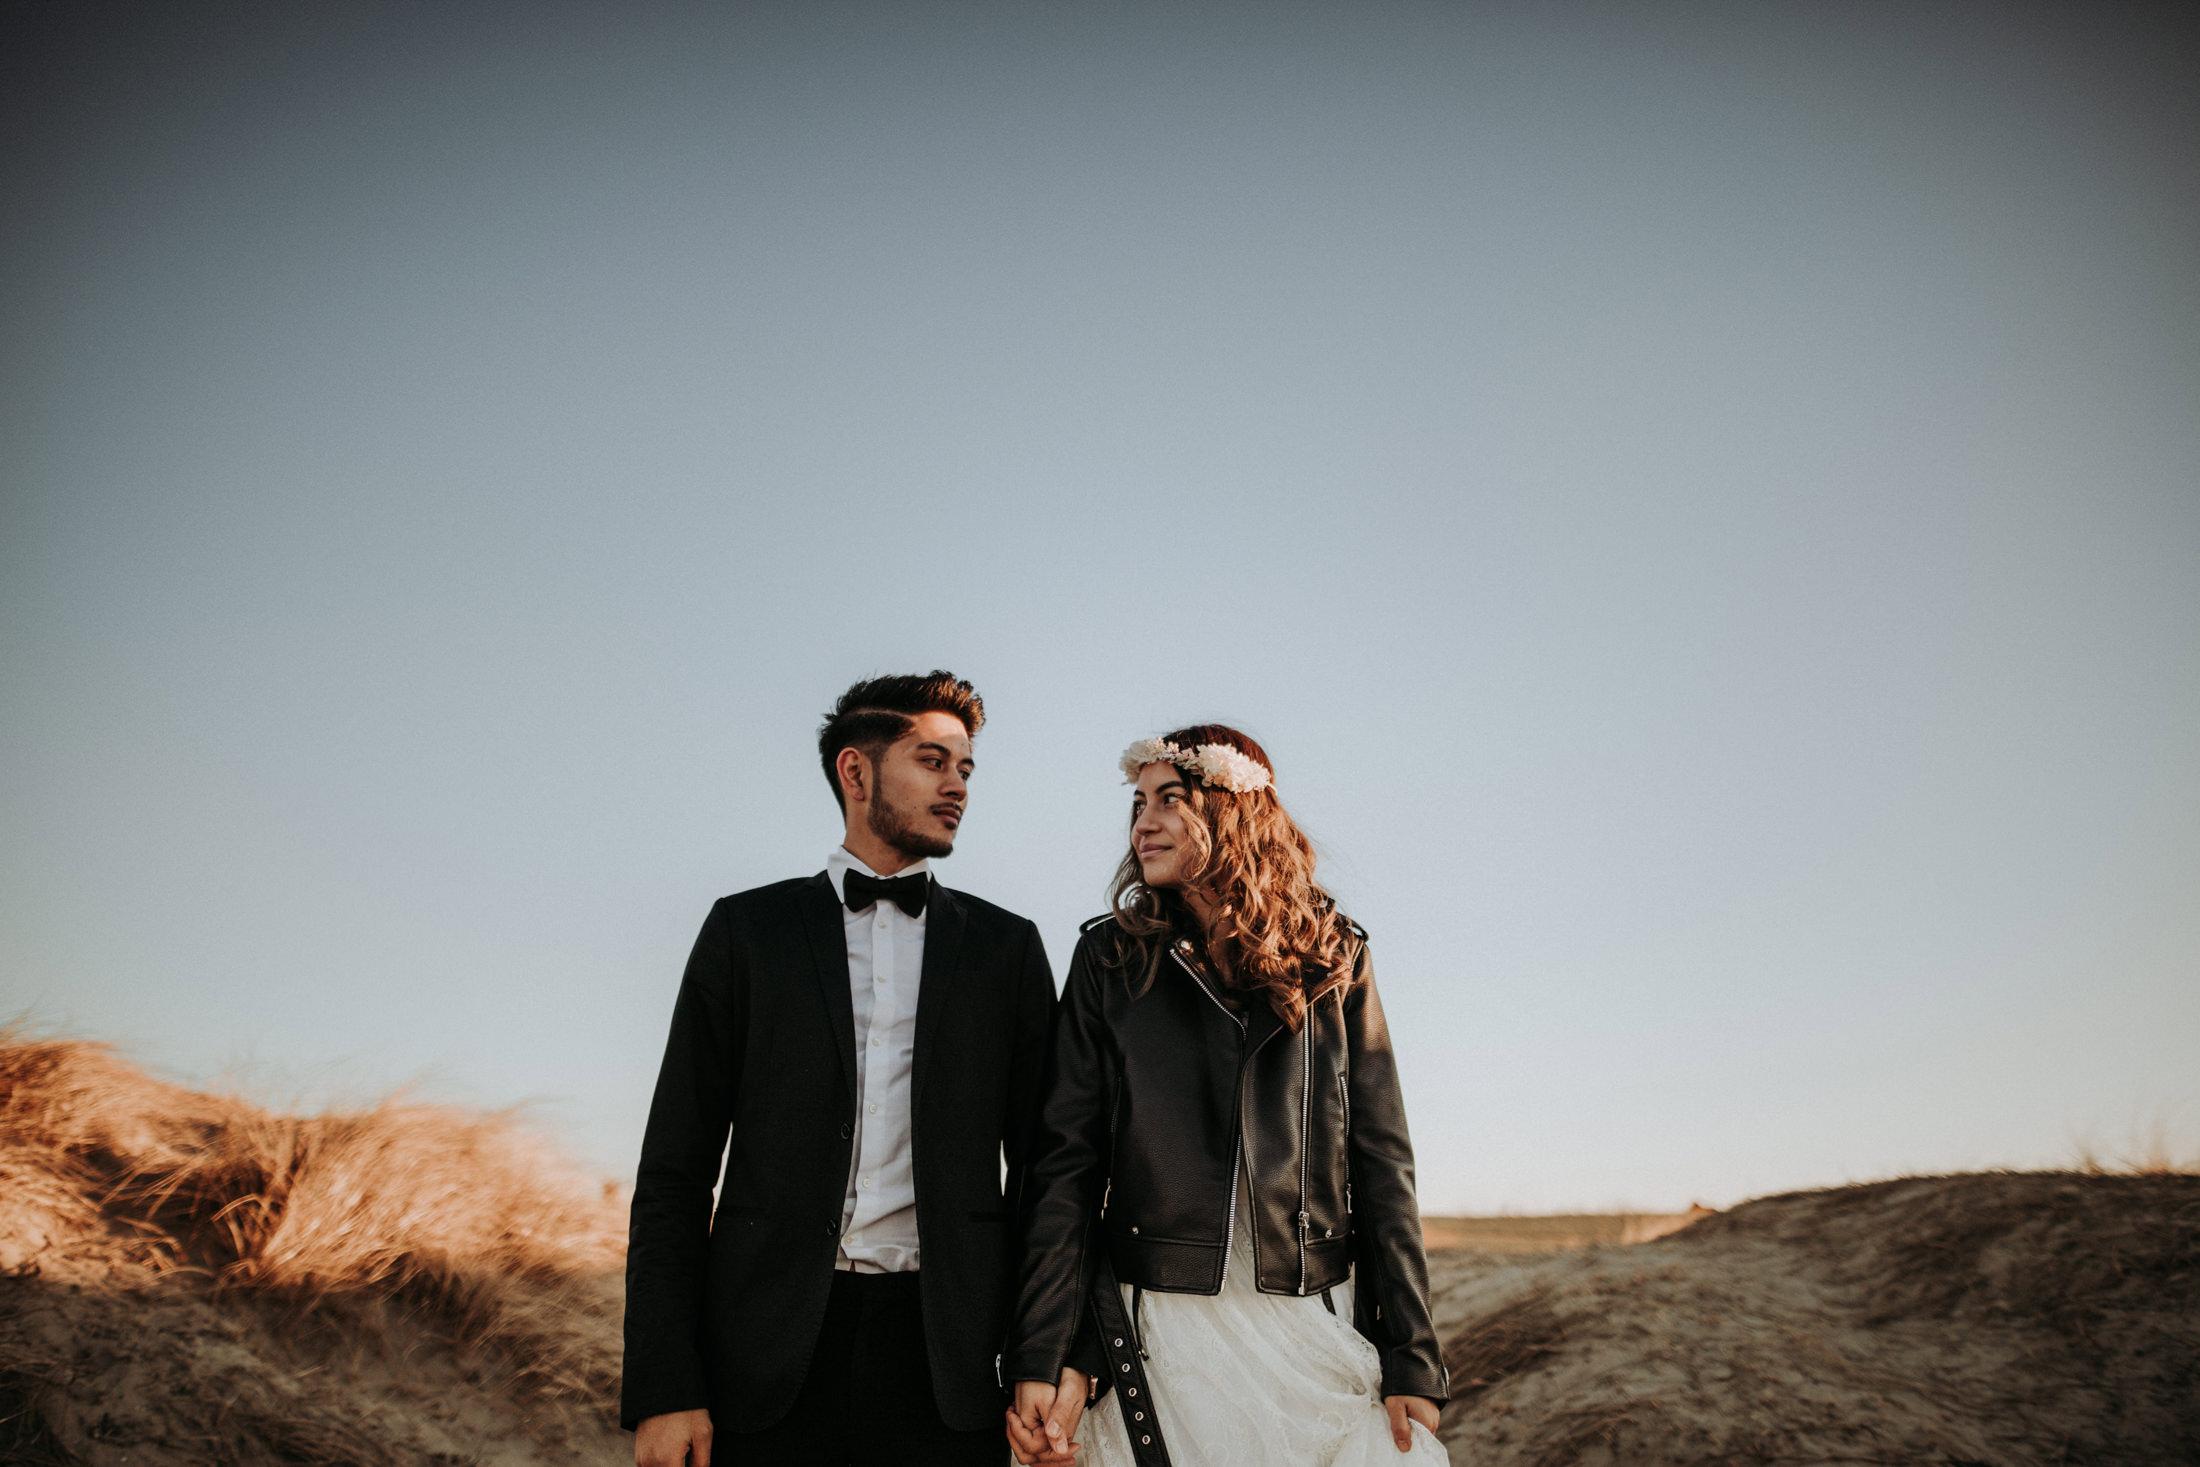 Wedding_Photographer_Mallorca_Daniela-Marquardt_Photography_CanaryIslands_Lanzarote_Iceland_Tuskany_Santorini_Portugal_Schweiz_Austria_Bayern_Elopement_Hochzeitsfotograf_Norddeichich_13